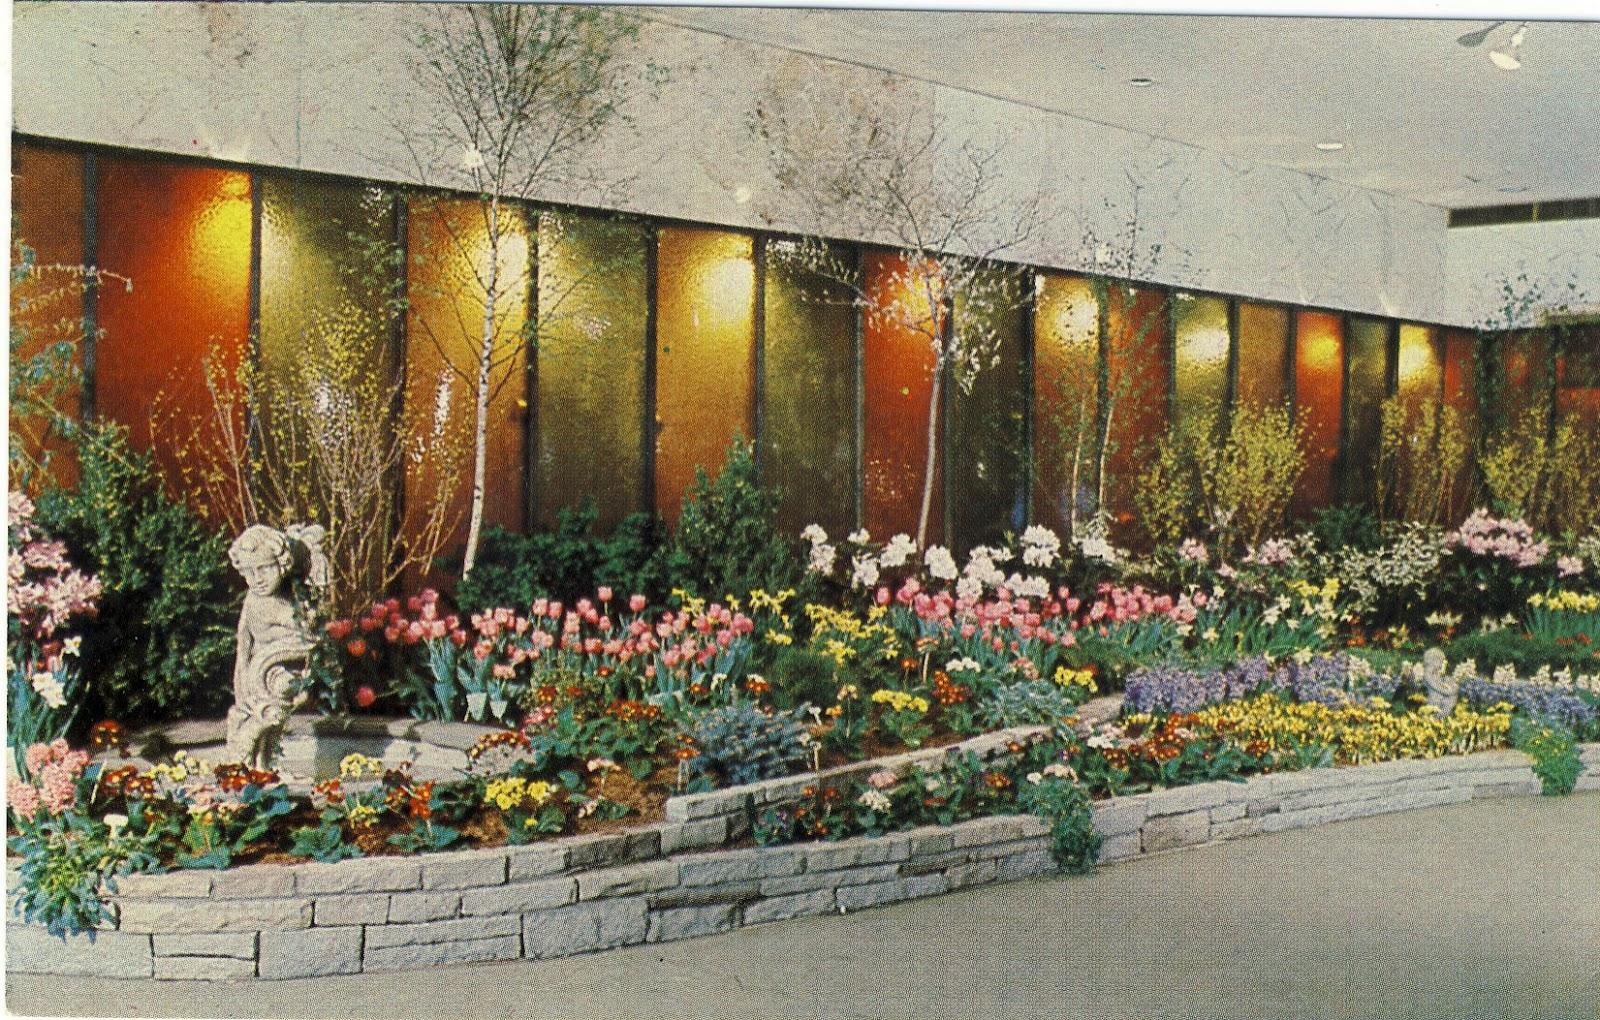 home and garden show toronto zandalus net a box of postcards